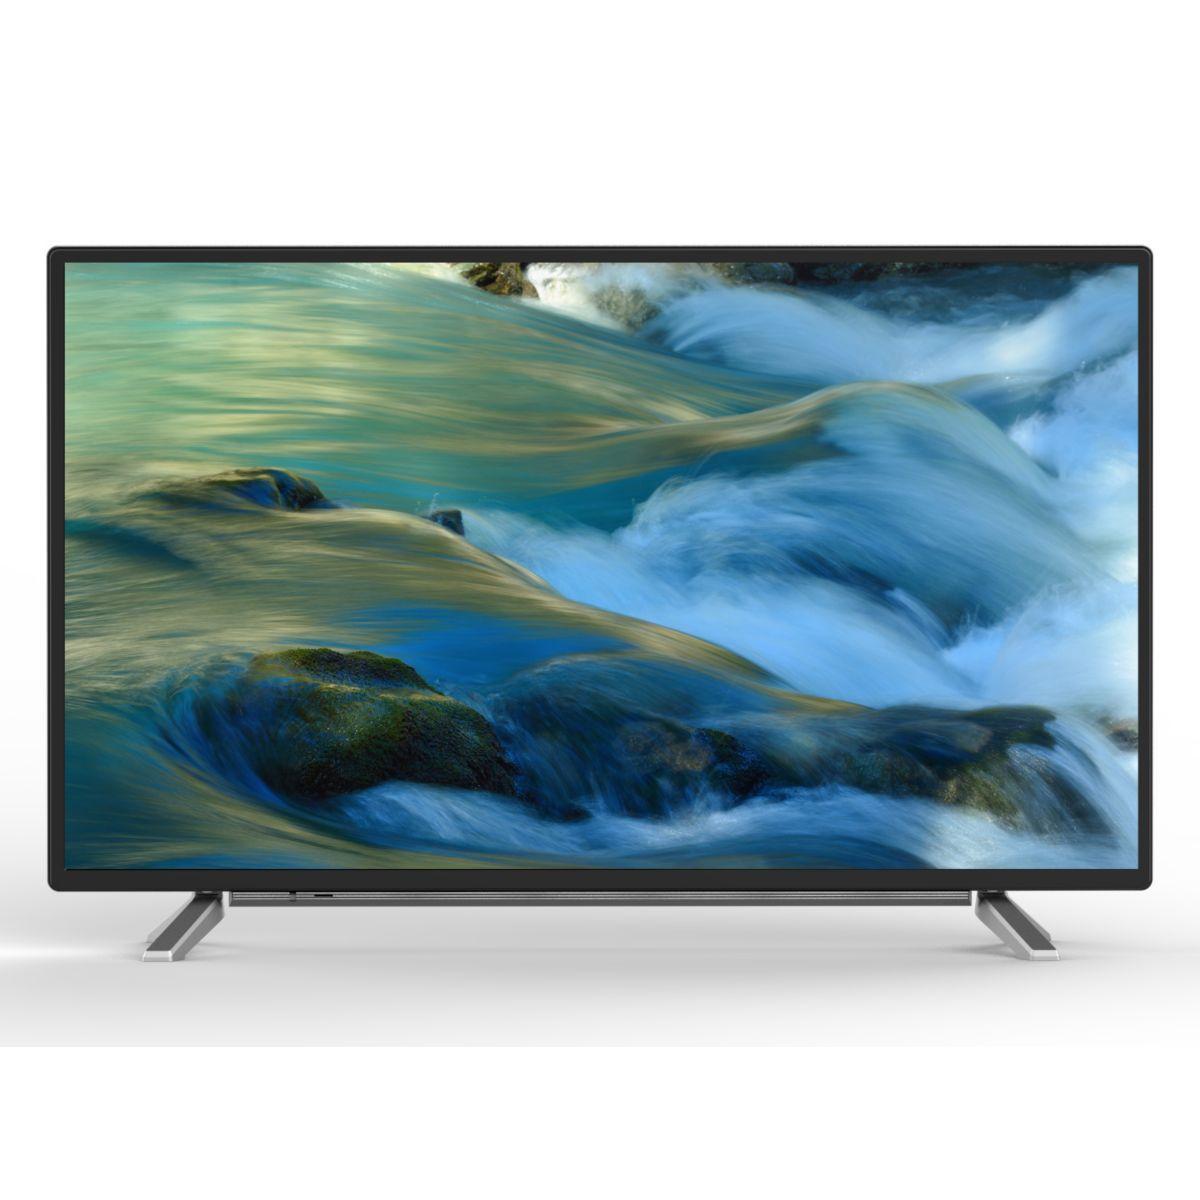 Tv grundig 49vlx7730bp - 5% de remise imm�diate avec le code : noel5 (photo)